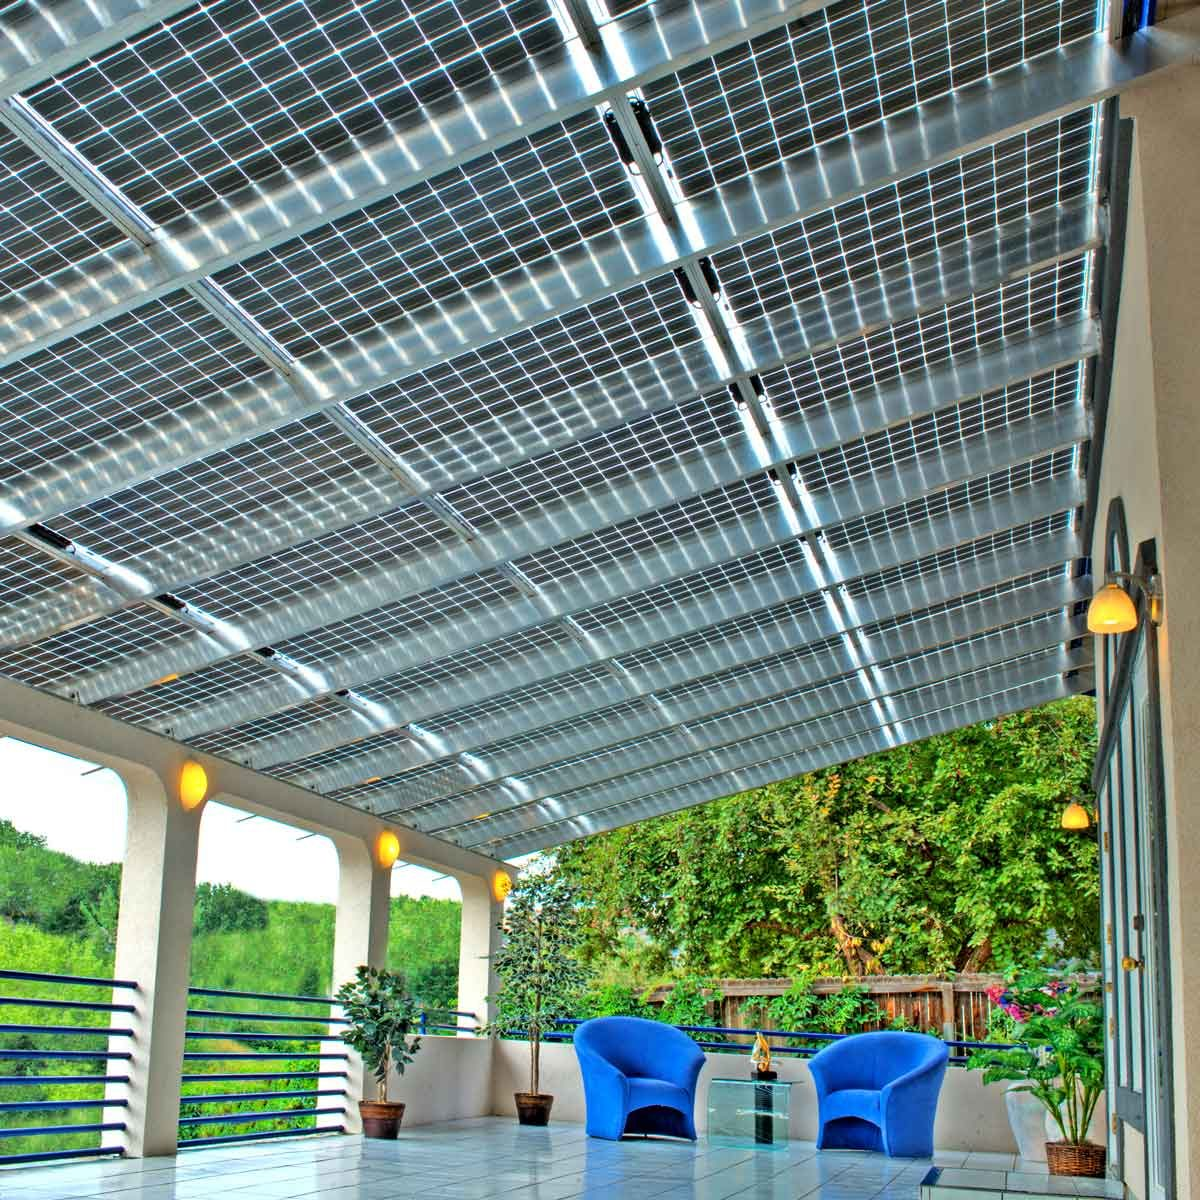 solar panels on roof under patio